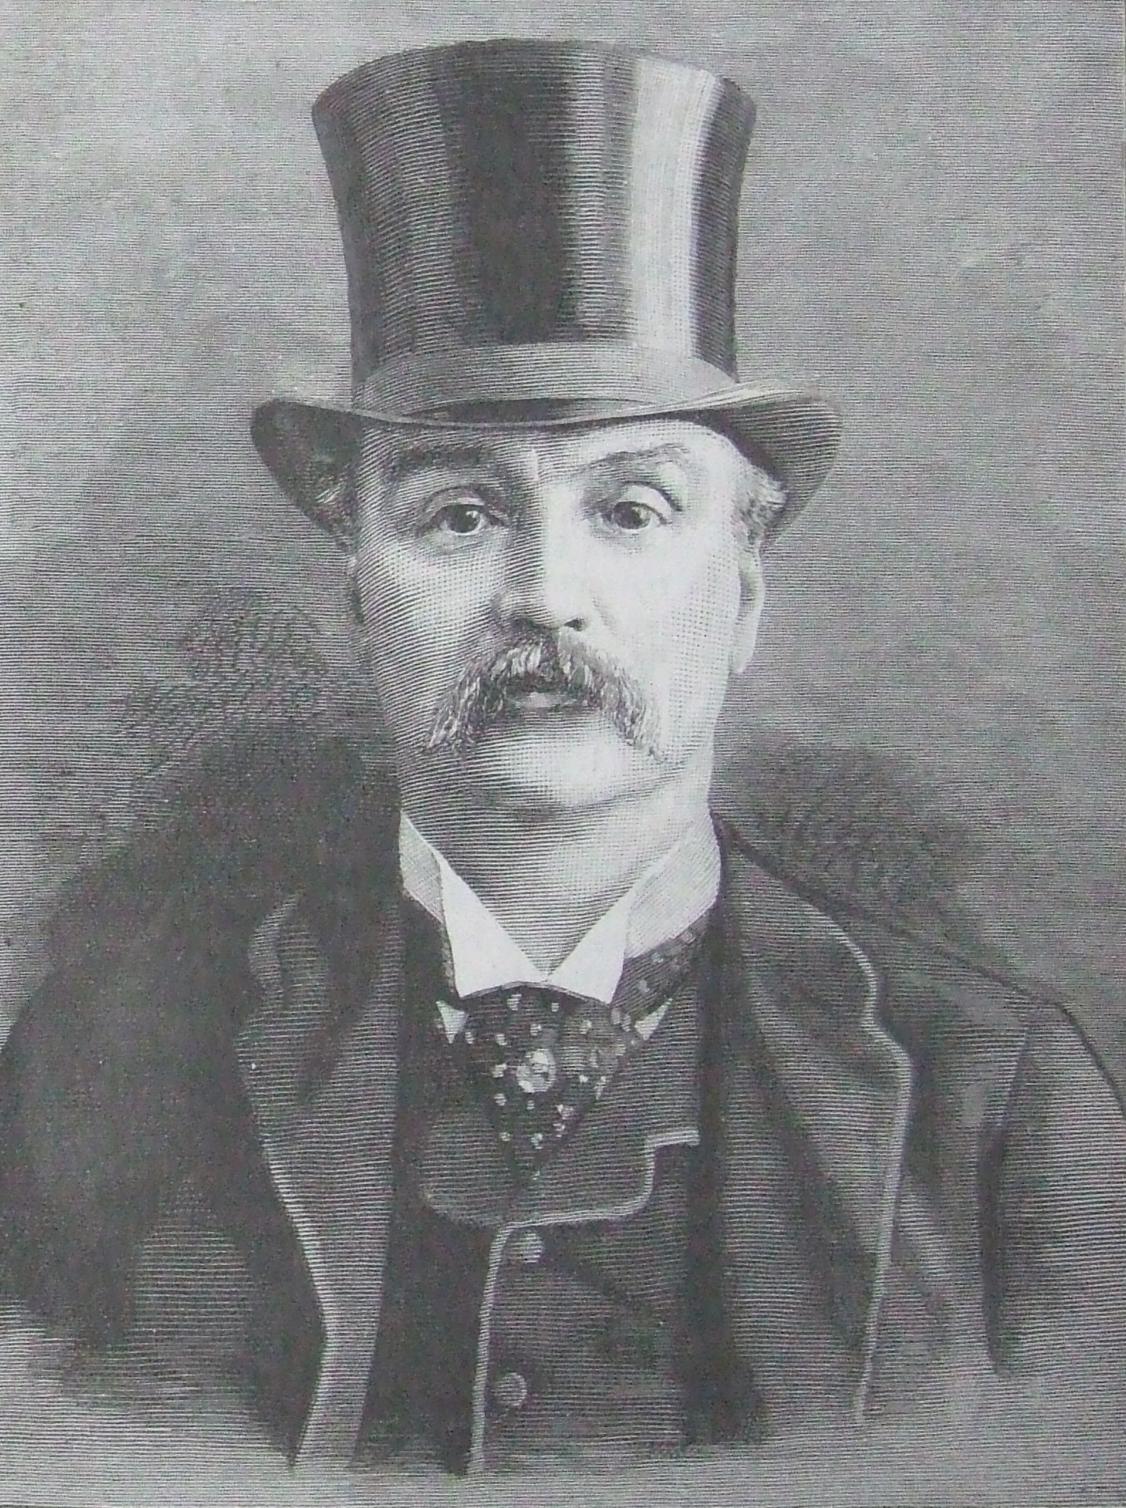 James Maybrick - Wikipedia, la enciclopedia libre